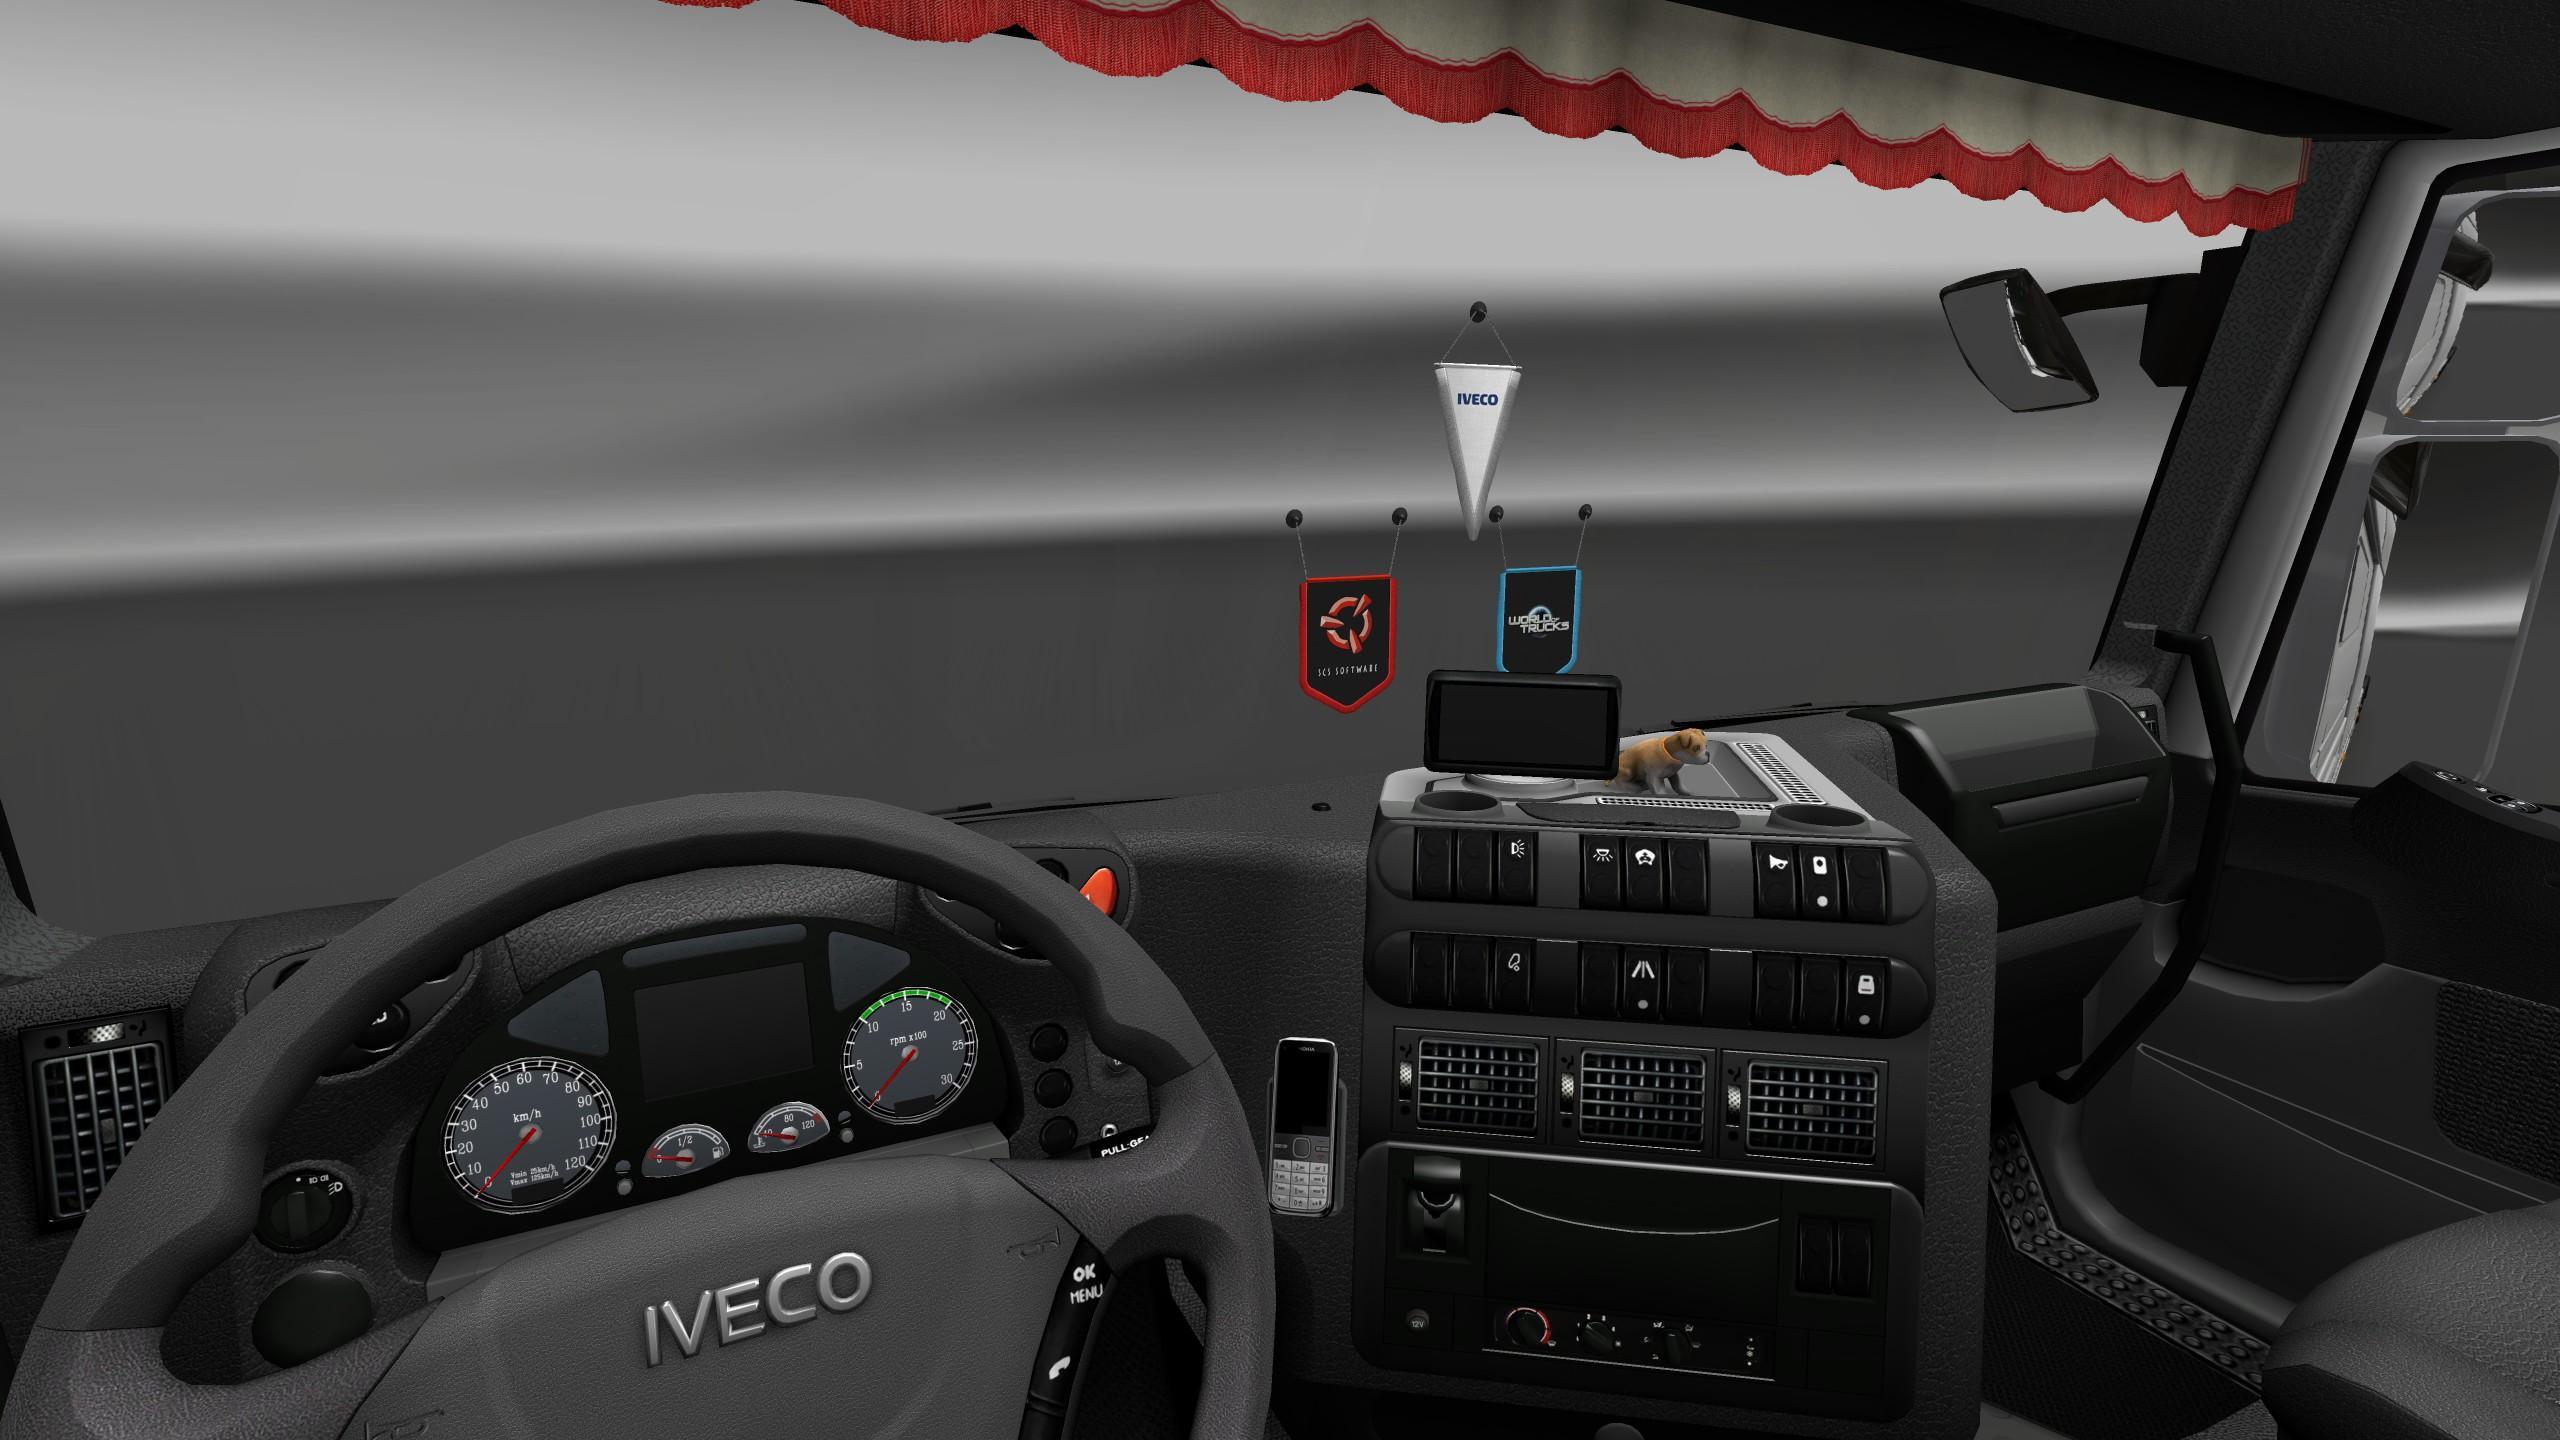 iveco stralis interior exterior rework mod euro truck simulator 2 mods. Black Bedroom Furniture Sets. Home Design Ideas